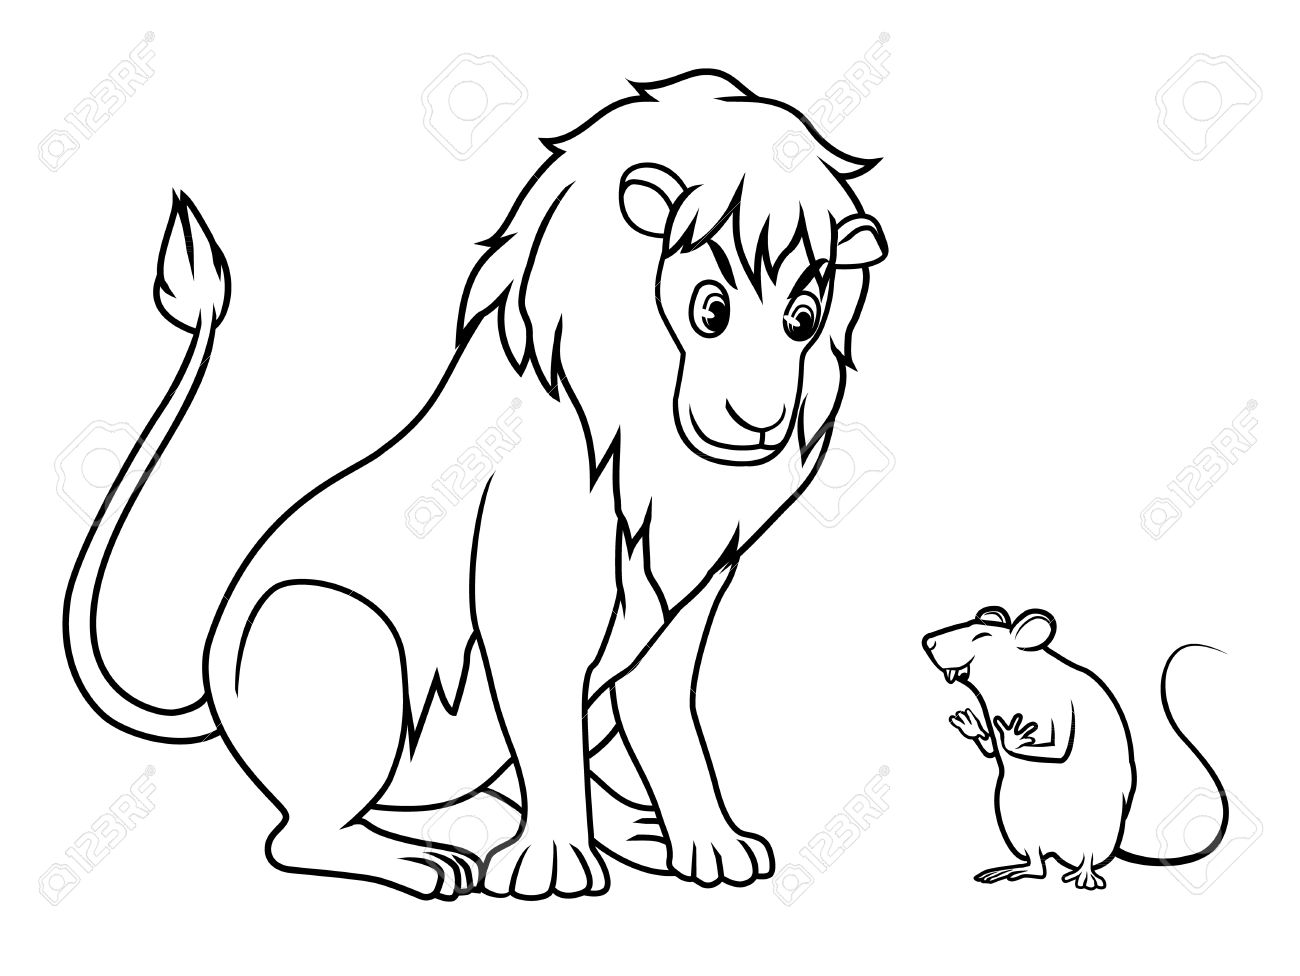 1300x976 Lion And Rat Drawing Cartoon Vector Royalty Free Cliparts, Vectors